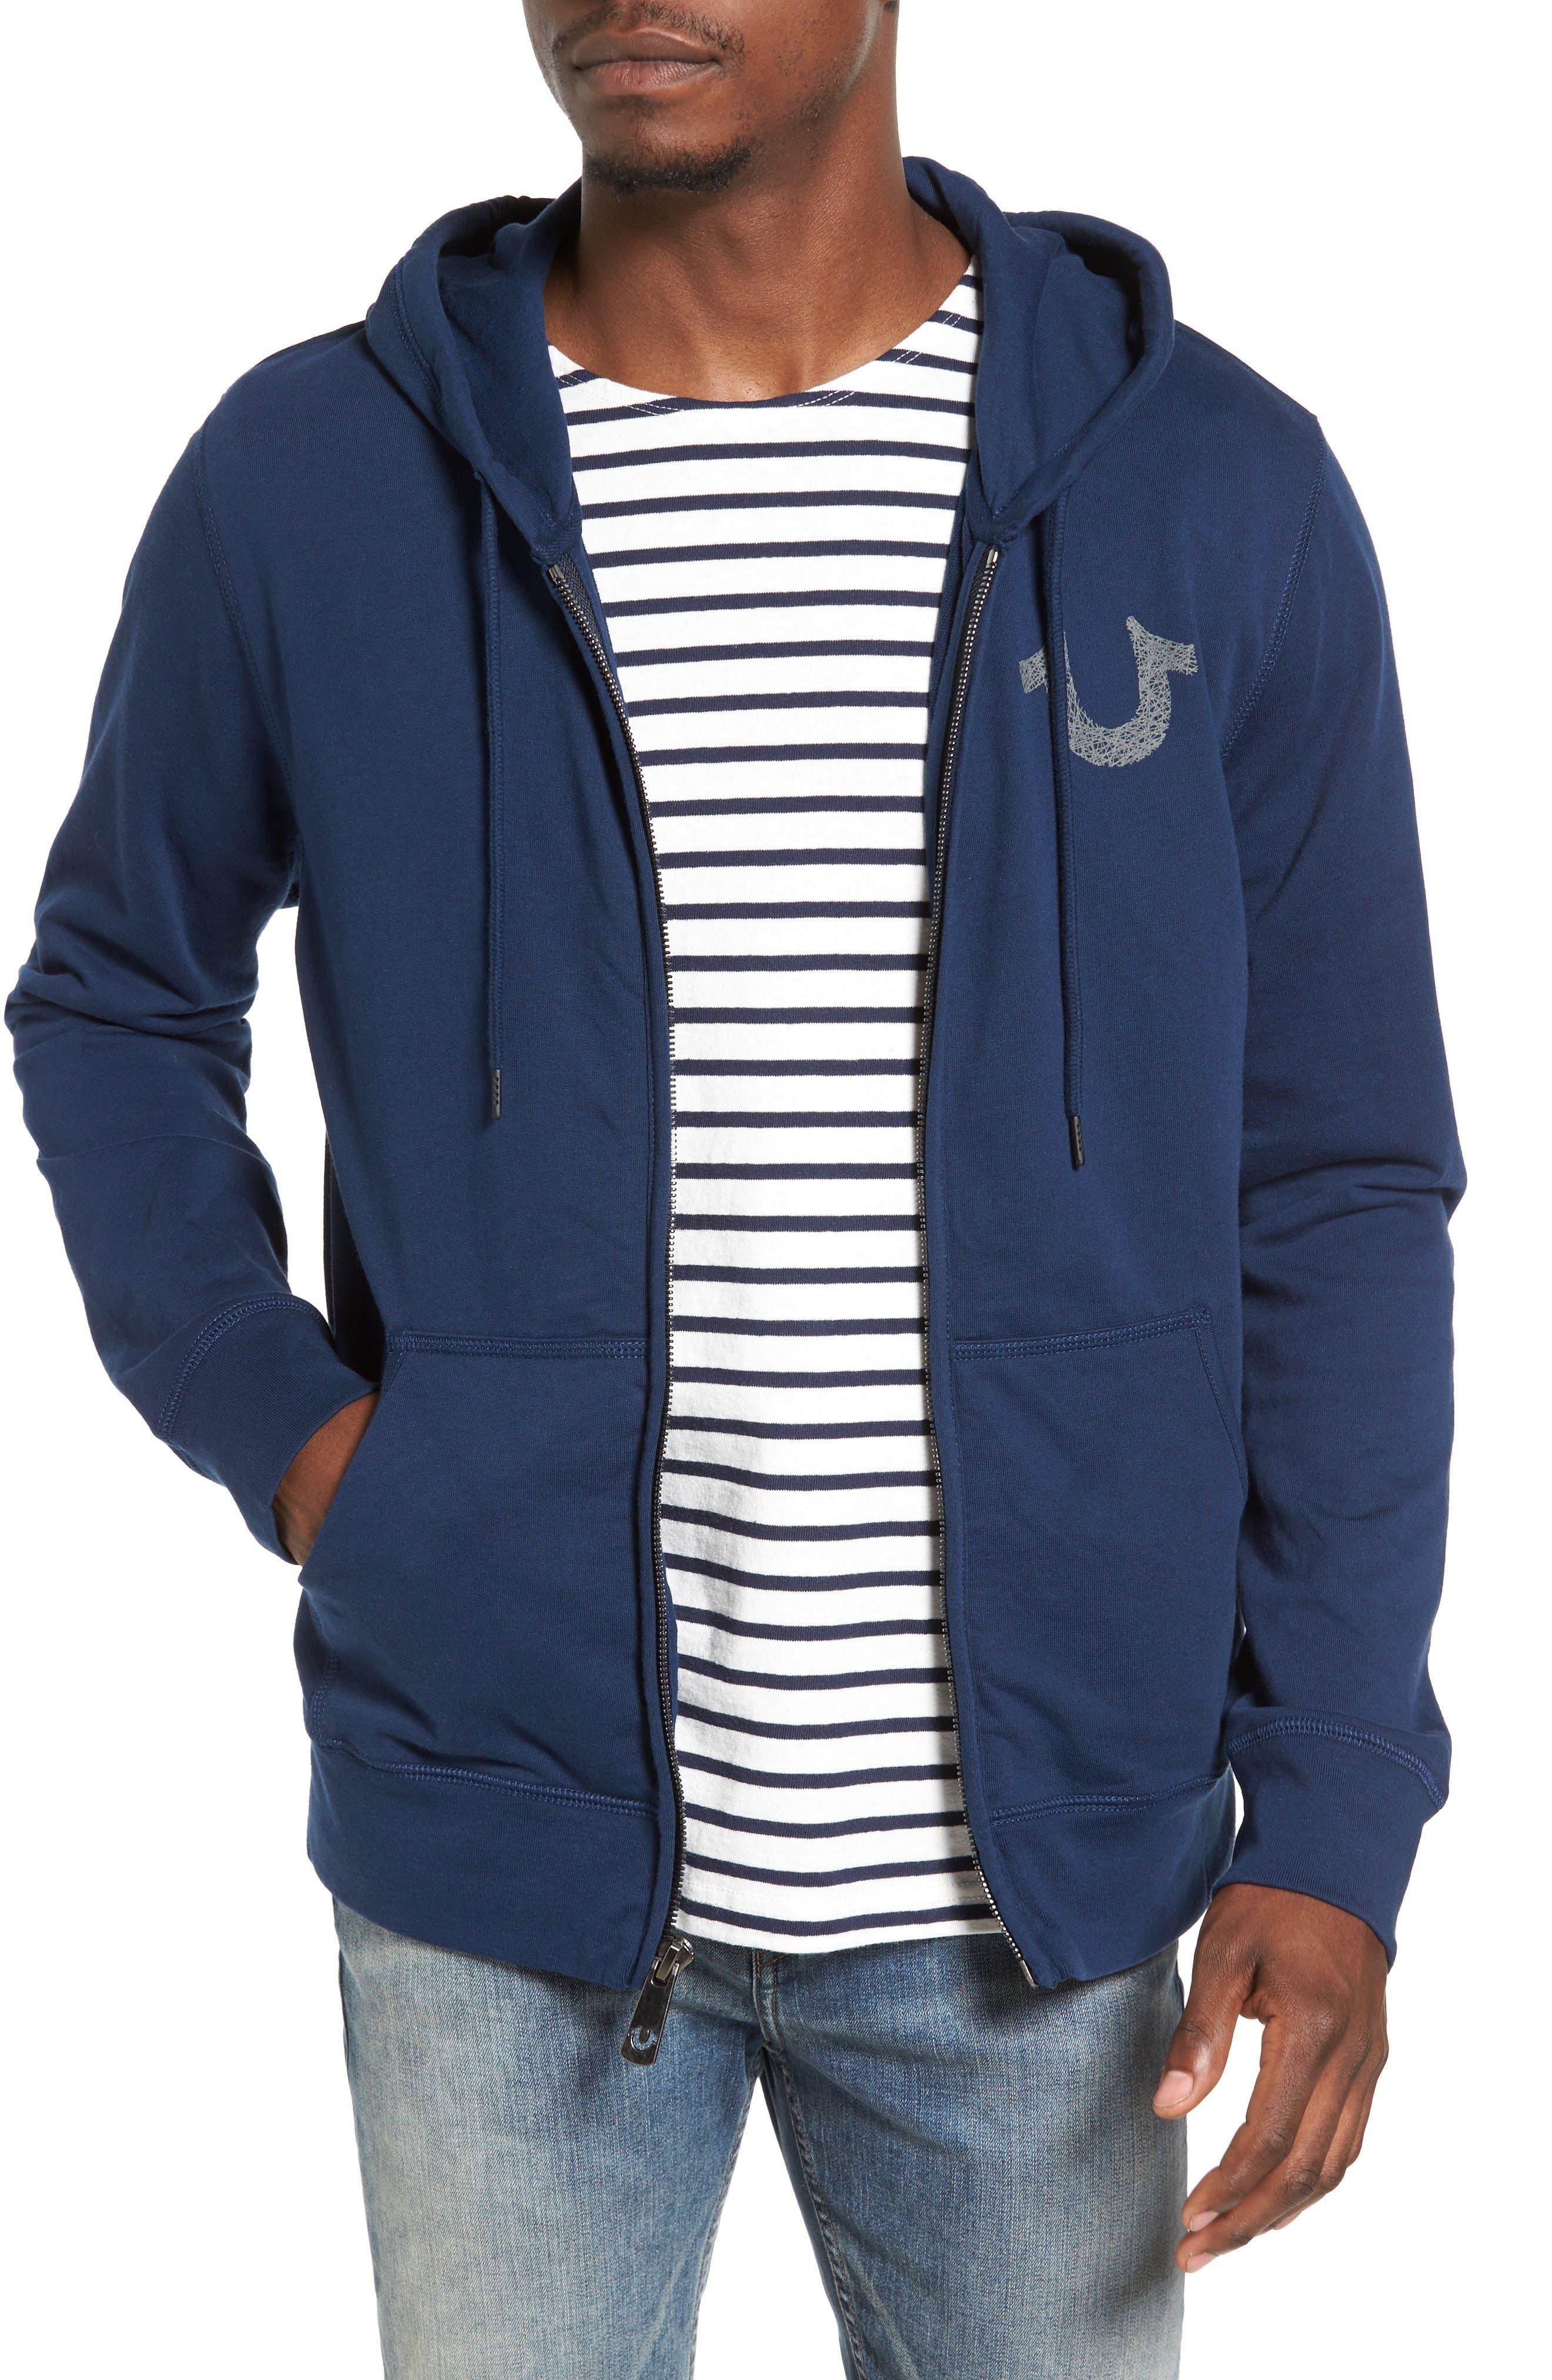 True Religion Brand Jeans Zip Hoodie